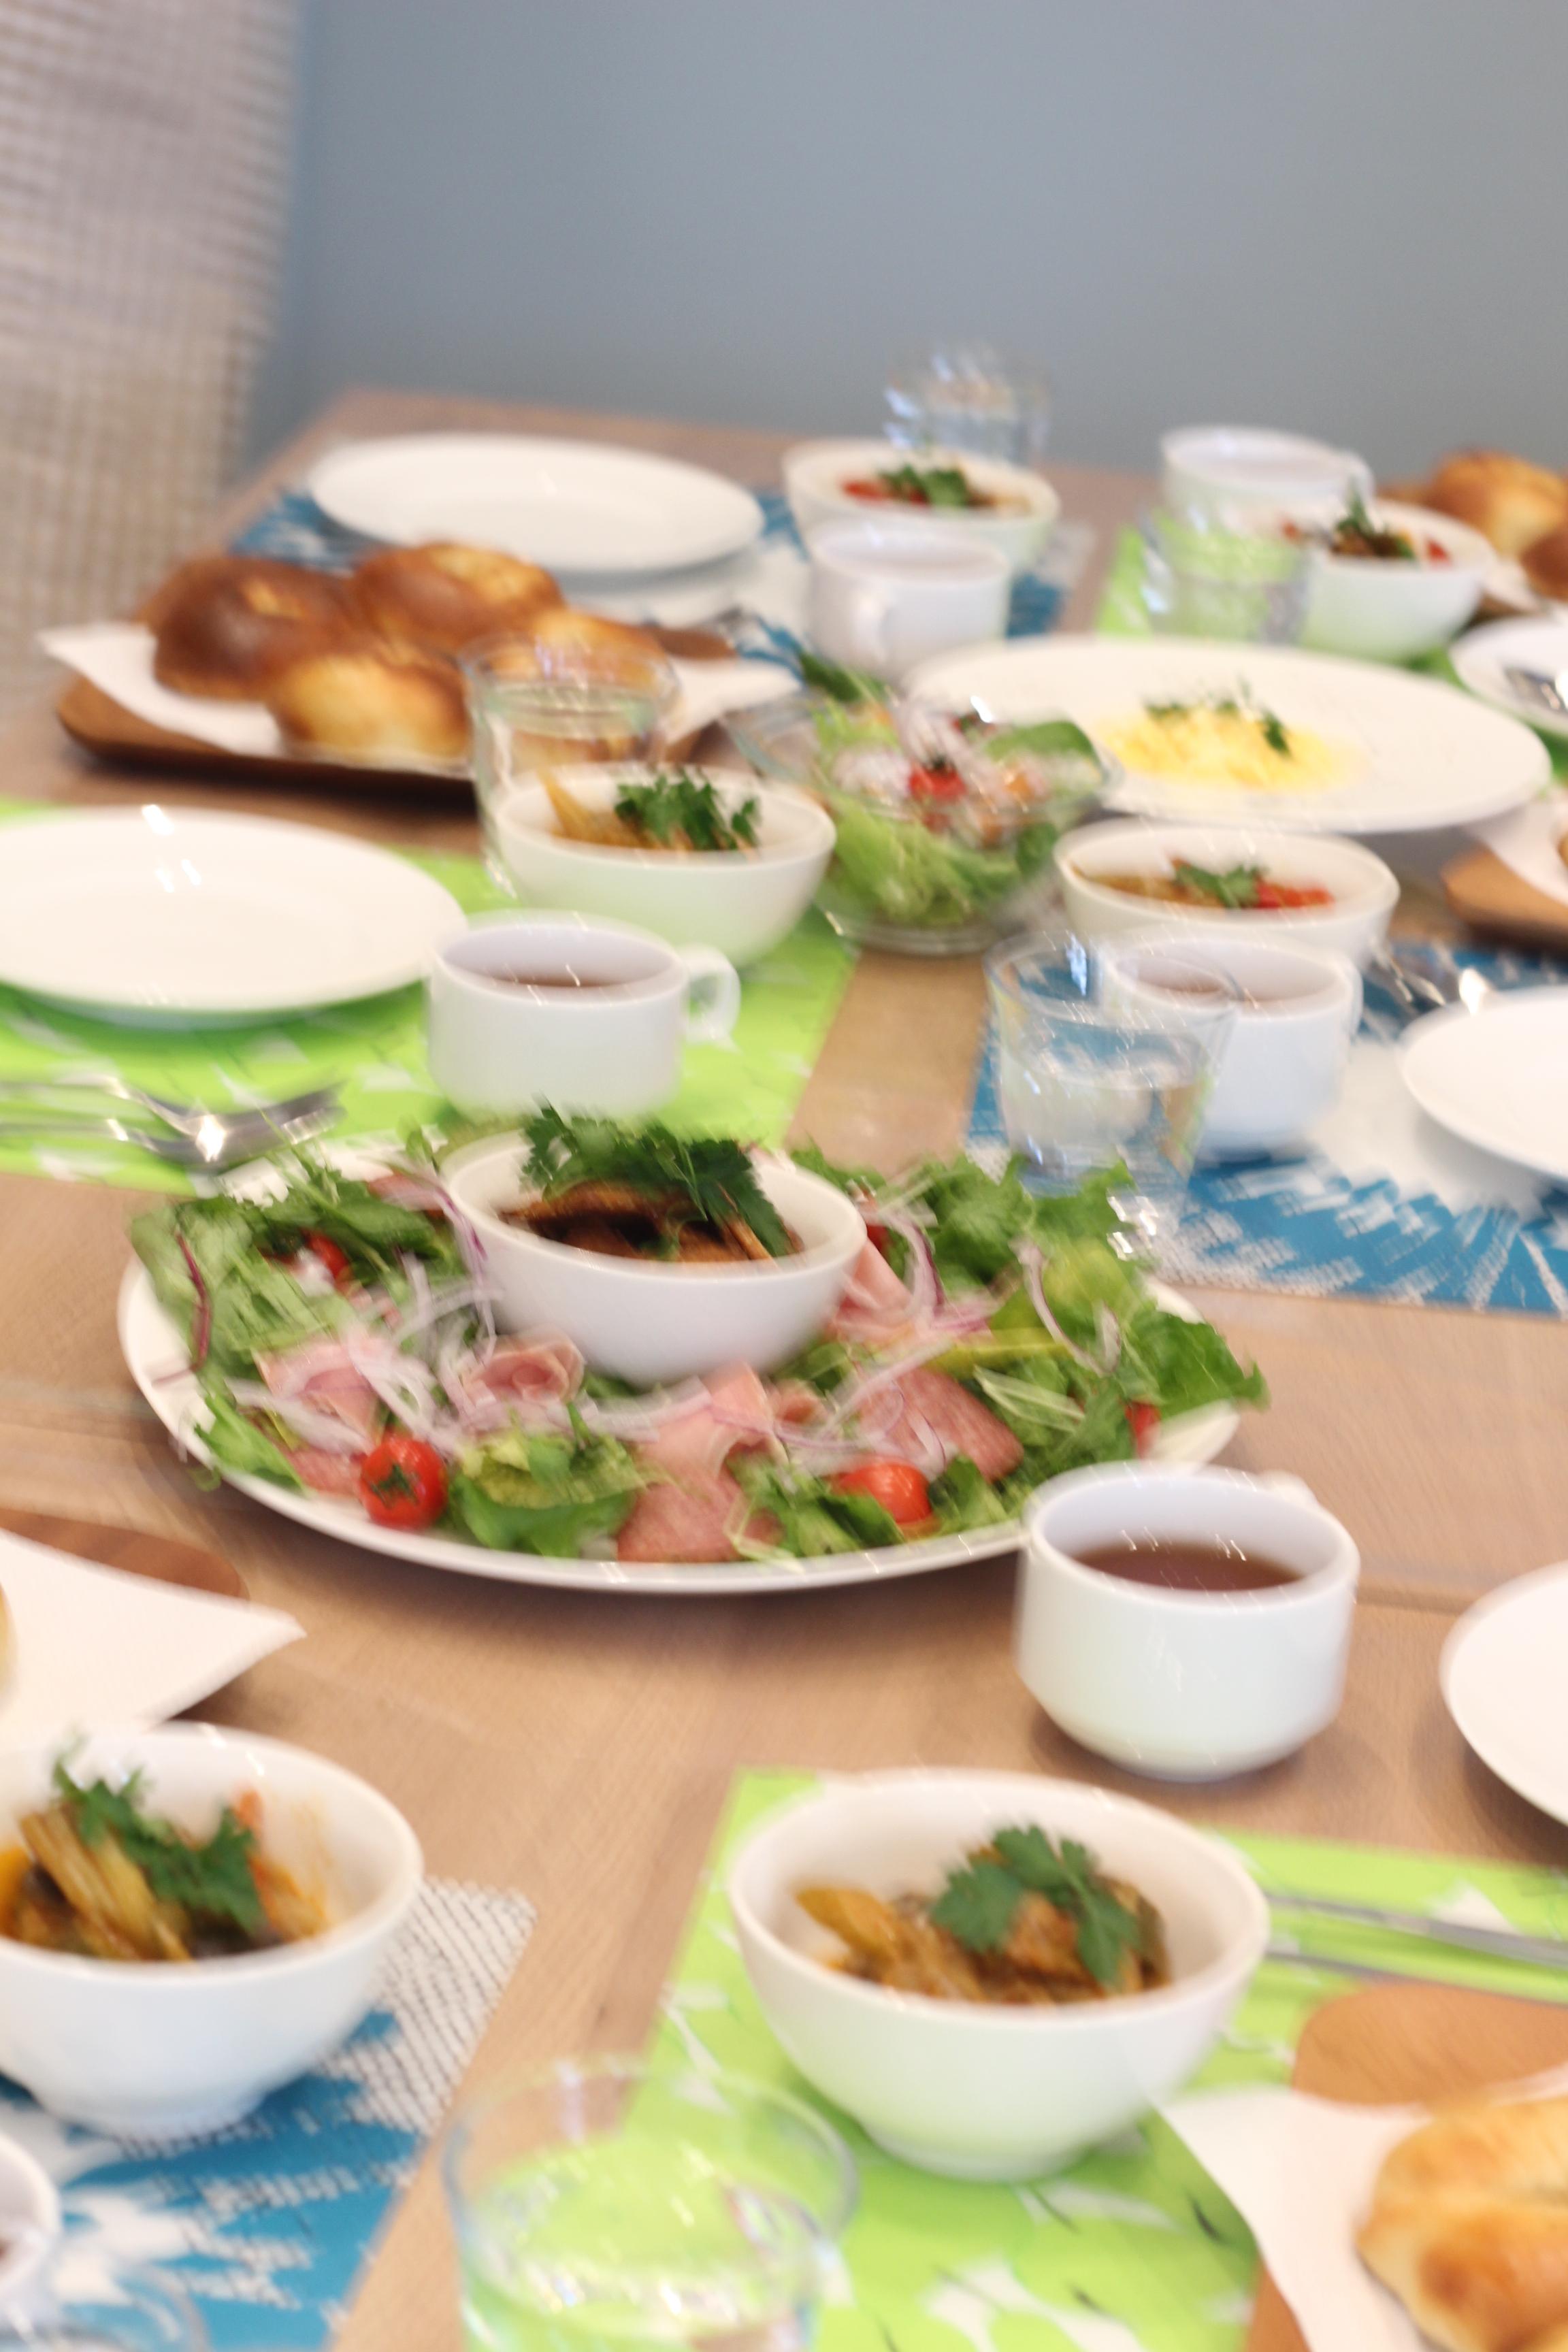 a-ta-sante糖質制限パン料理教室、京都江部粉糖質制限パンベーシックコース2回目『ベーグル&クラッカー』